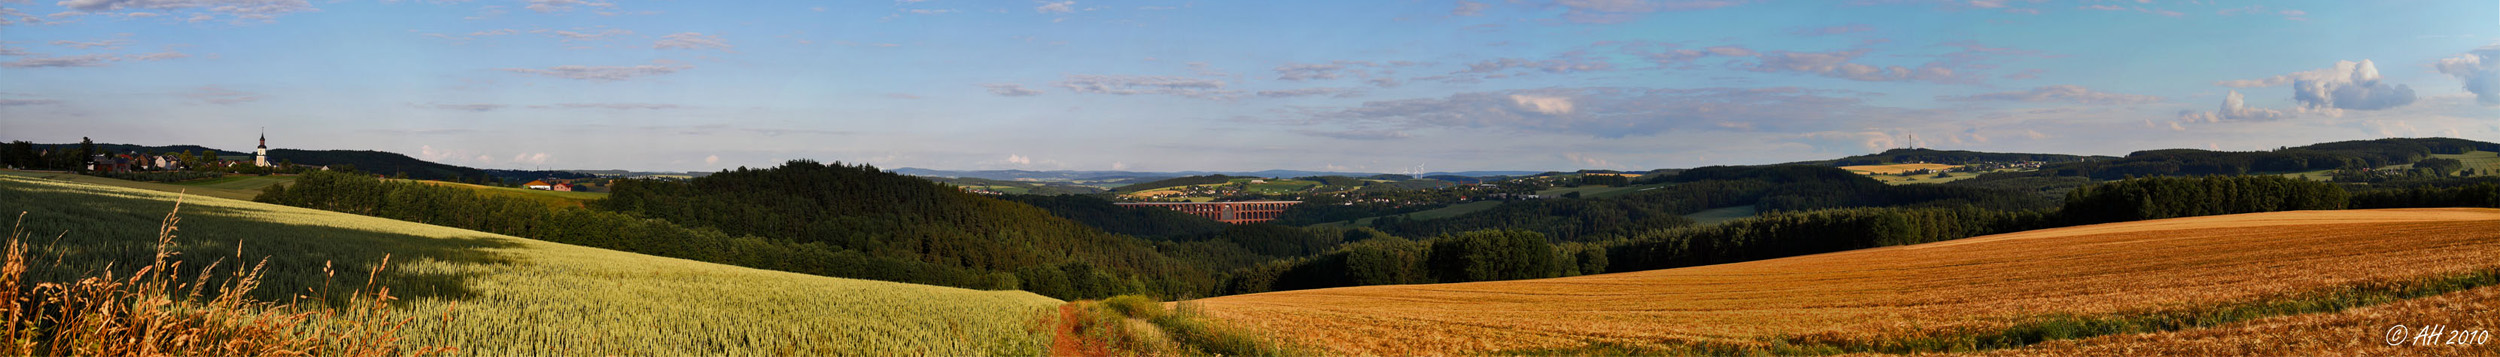 Vogtlandpanorama...